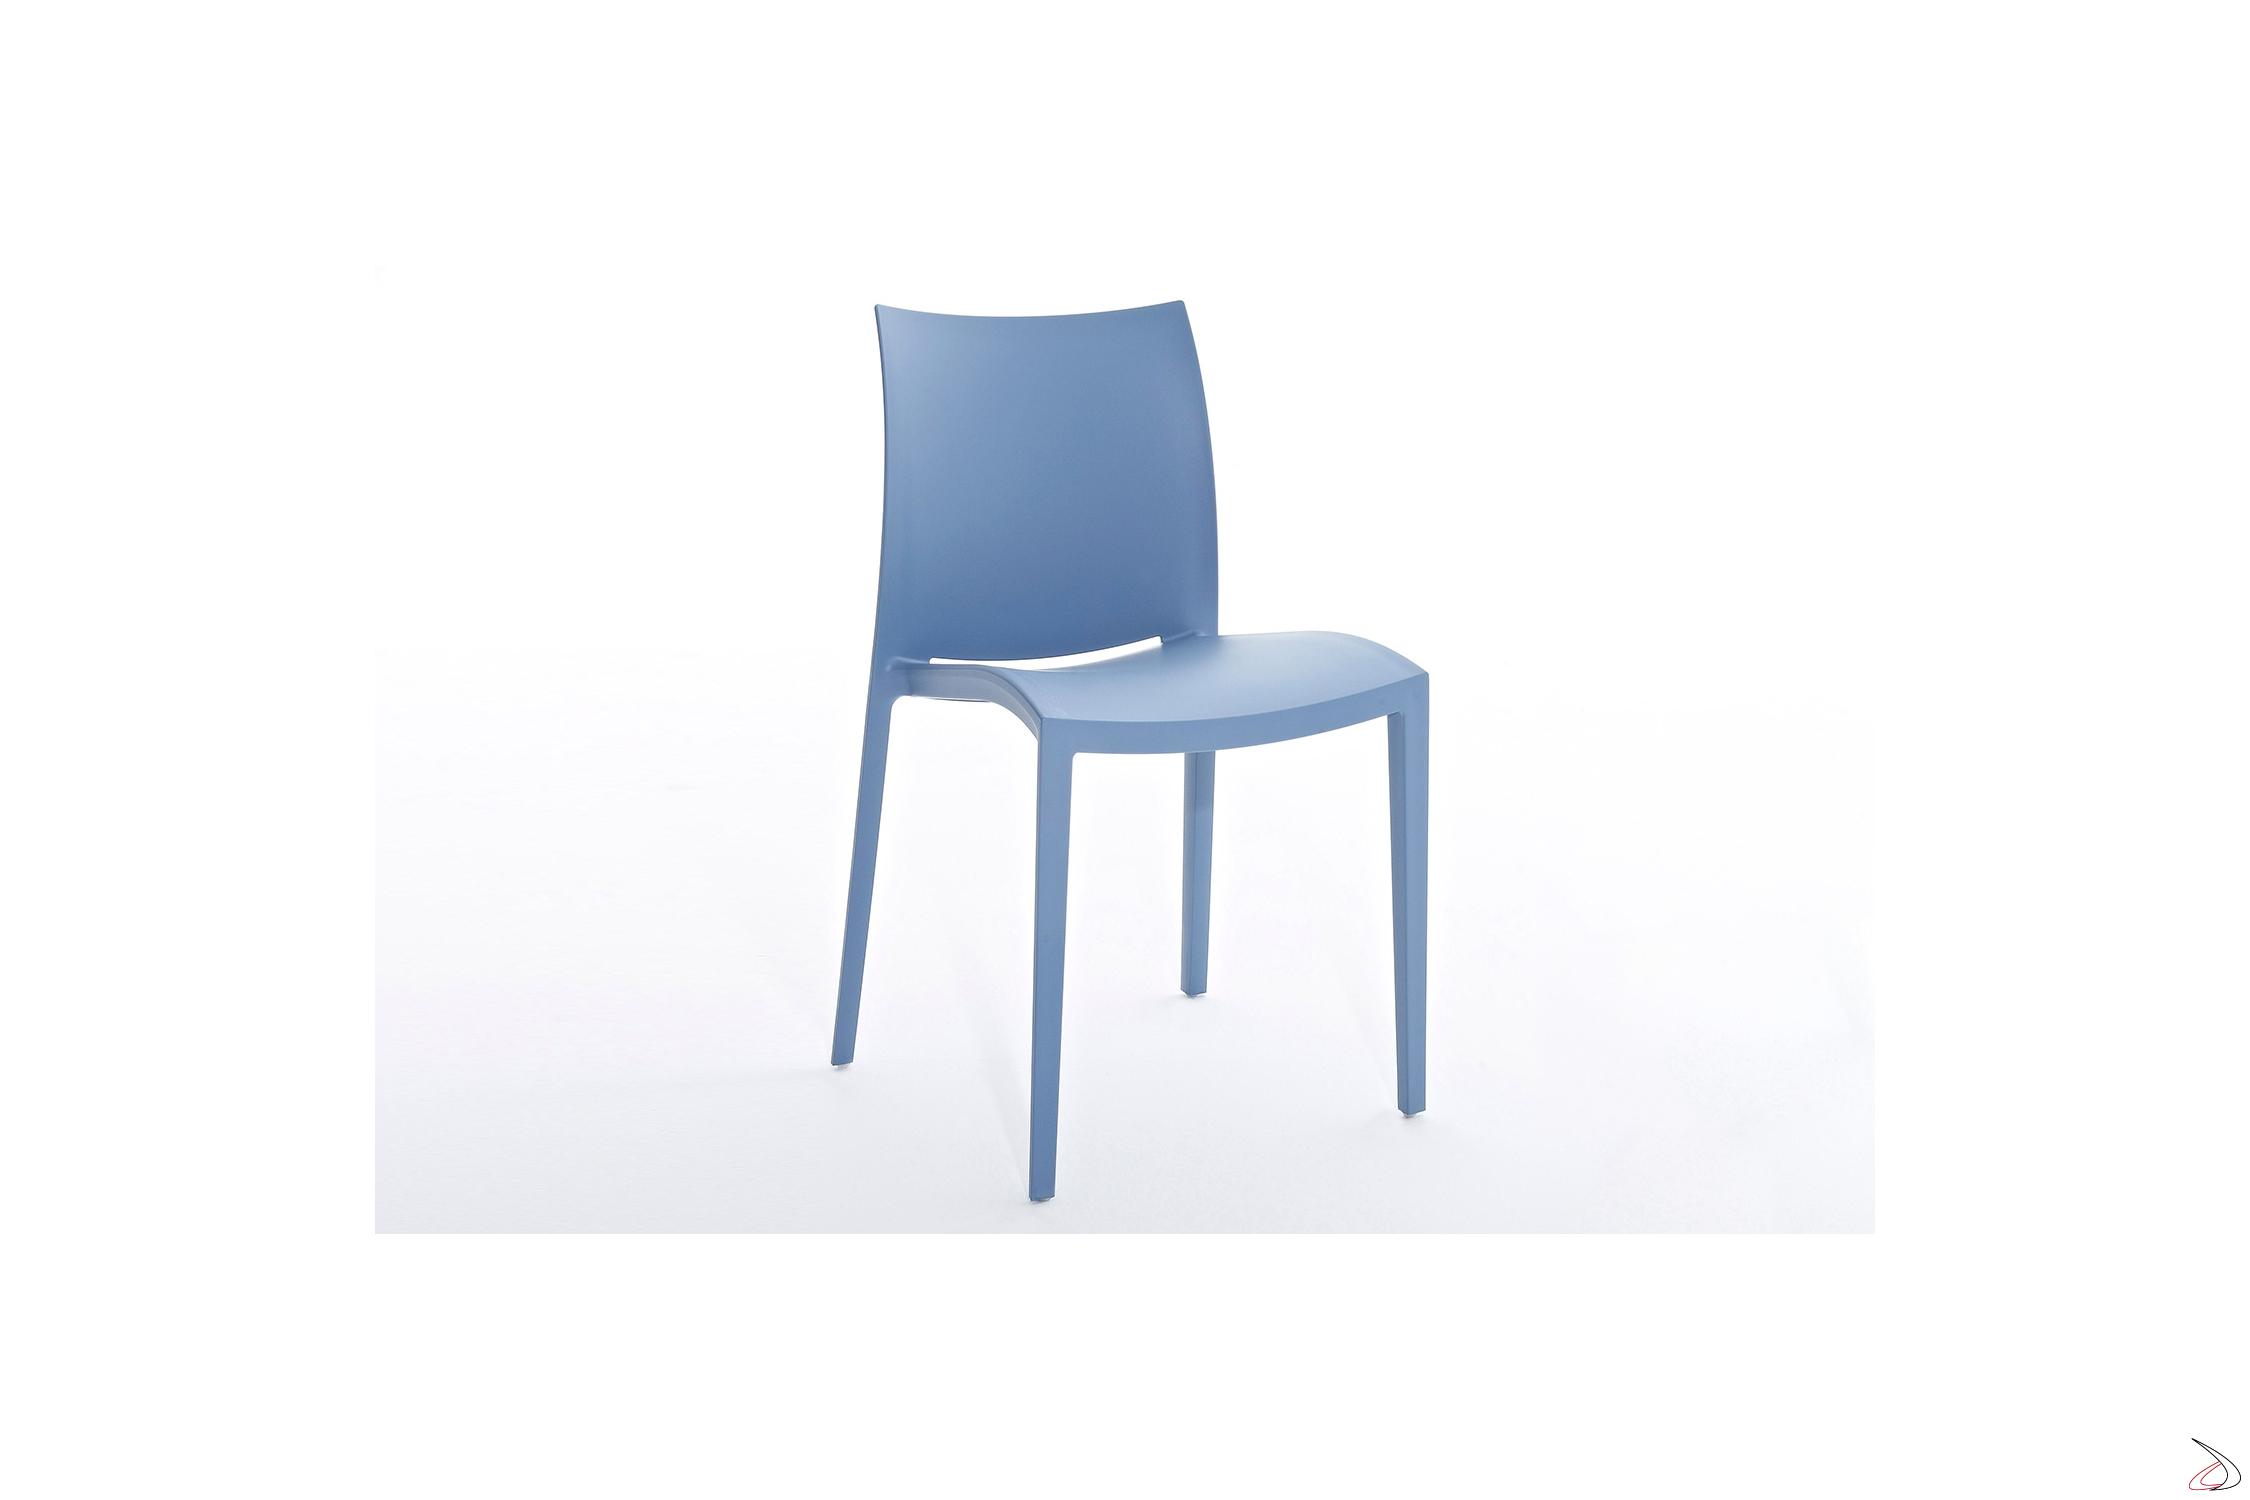 Sedie Colorate Da Giardino.Go Polypropylen Gartenstuhl Von Colico Toparredi Arredo